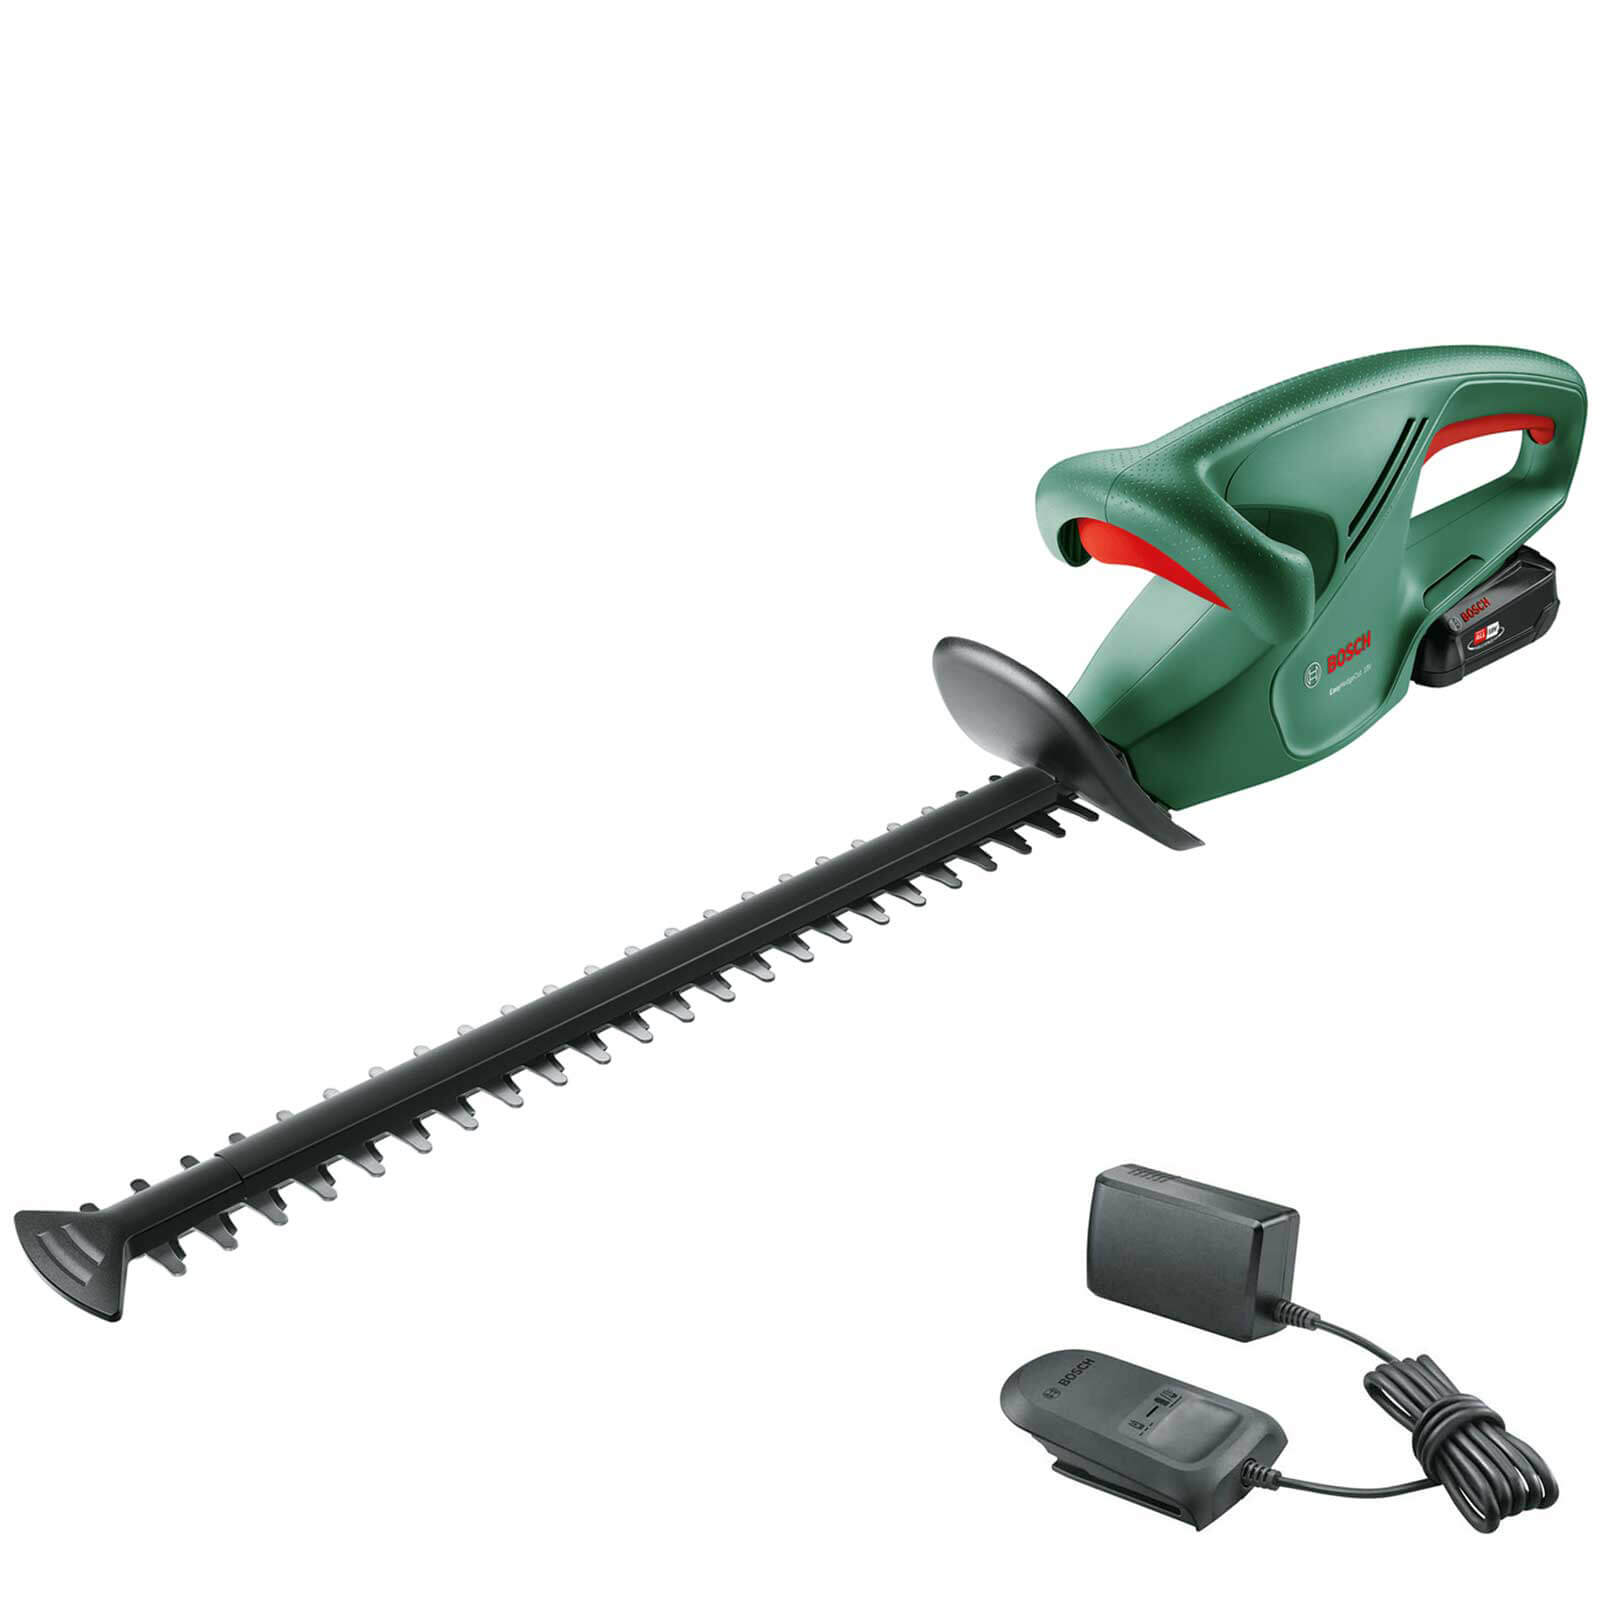 Bosch EASYHEDGECUT 18-45 18v Cordless Hedge Trimmer 450mm 1 x 2.5ah Li-ion Charger